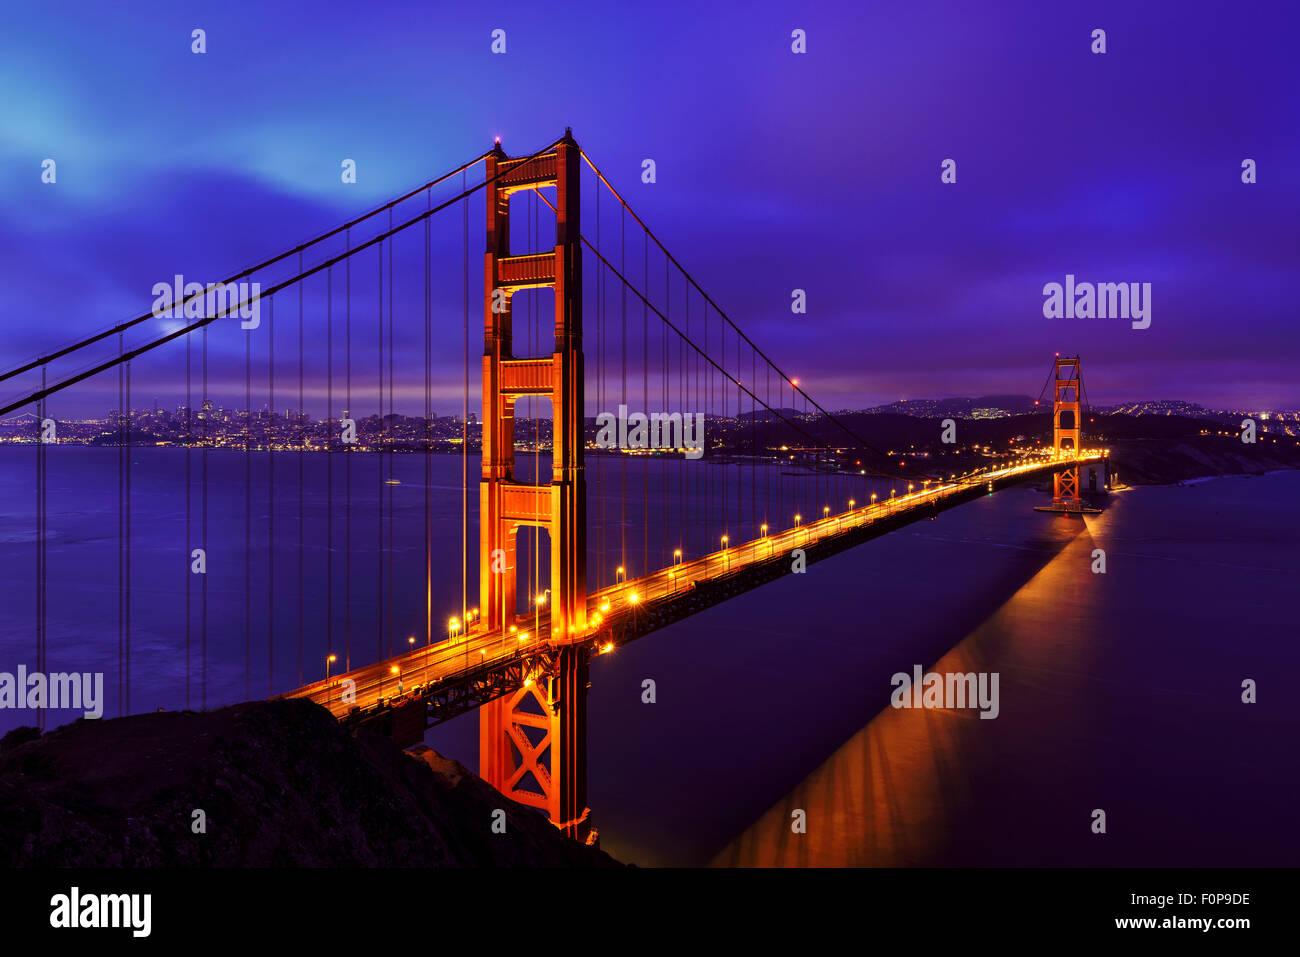 Noche azul en el Golden Gate Bridge, San Francisco Imagen De Stock